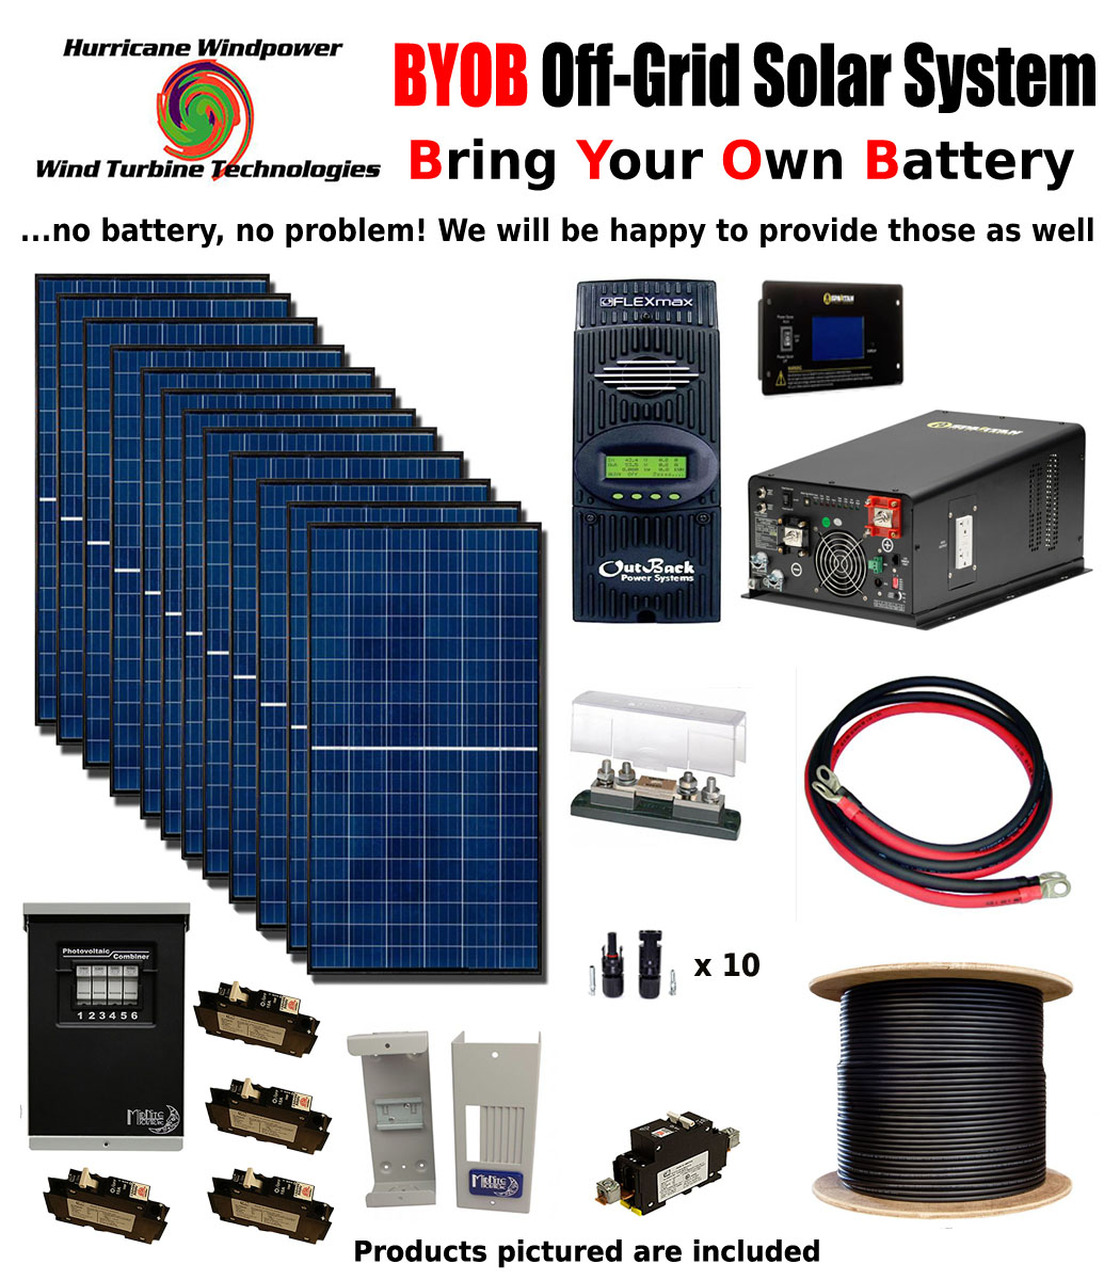 byob off grid 3 4kw 48v solar panel kit tiny house cabin pv system outback fm80 [ 1120 x 1280 Pixel ]